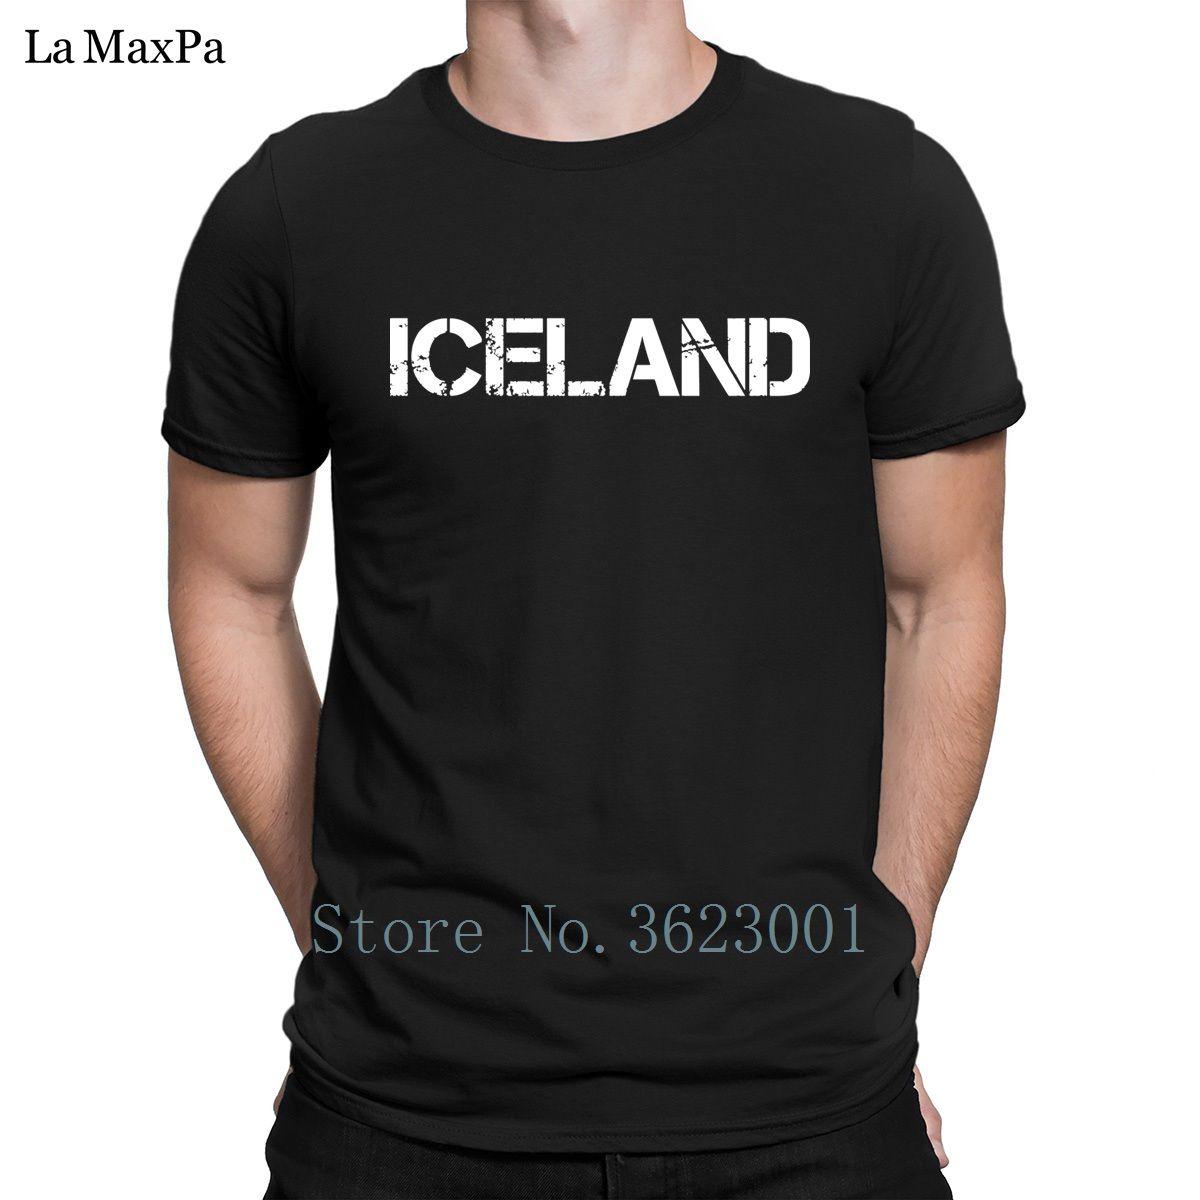 The New Formal Mens T Shirt Costume Islândia T-shirt básico Slim Fit Camiseta Homem Euro Tamanho camiseta solta